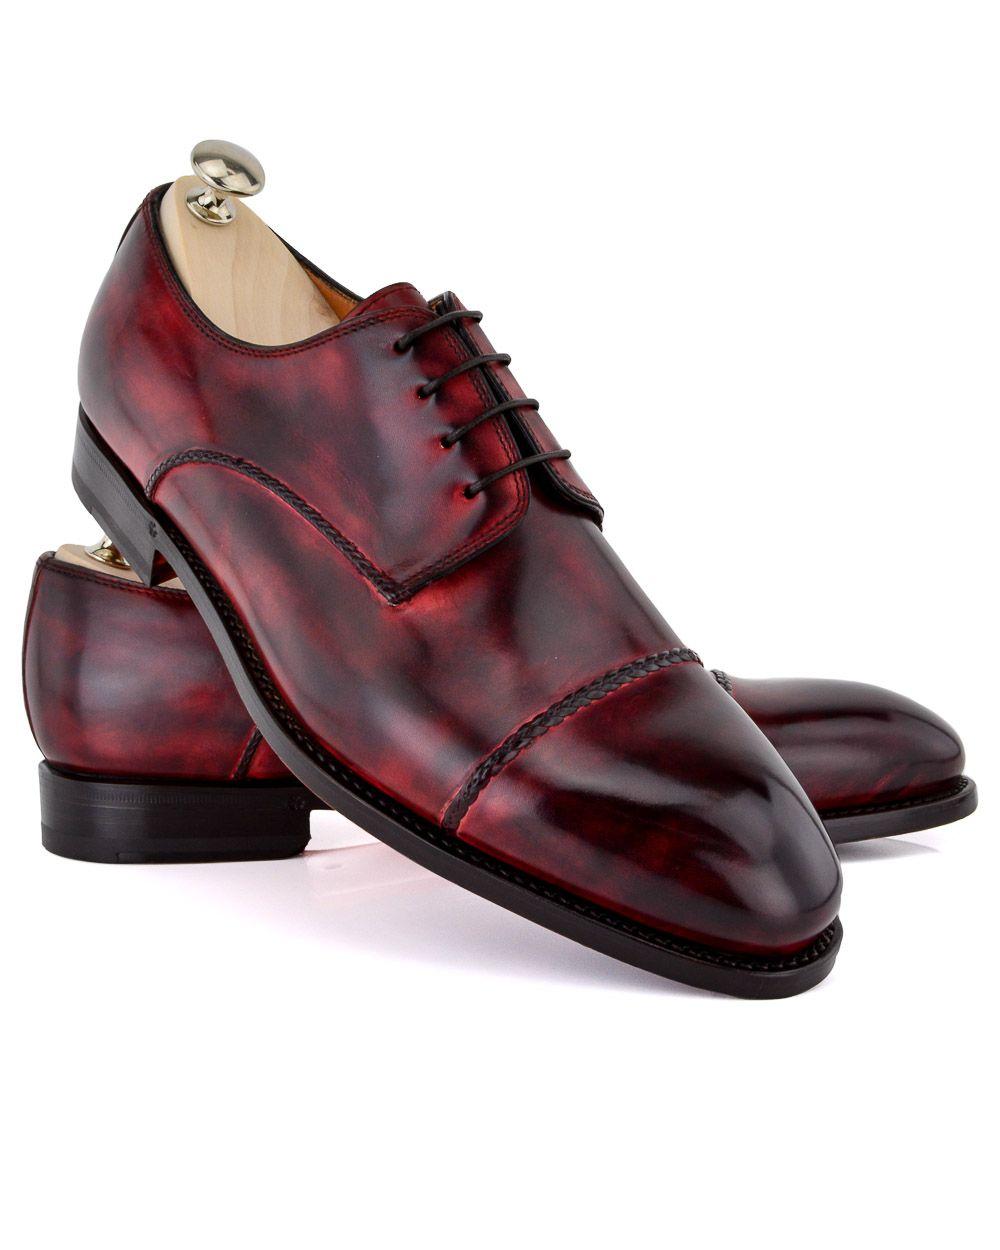 Bontoni Cherry D´Amore Cherry leather loafer Braided captoe 4 eyelet Blake  construction Leather sole